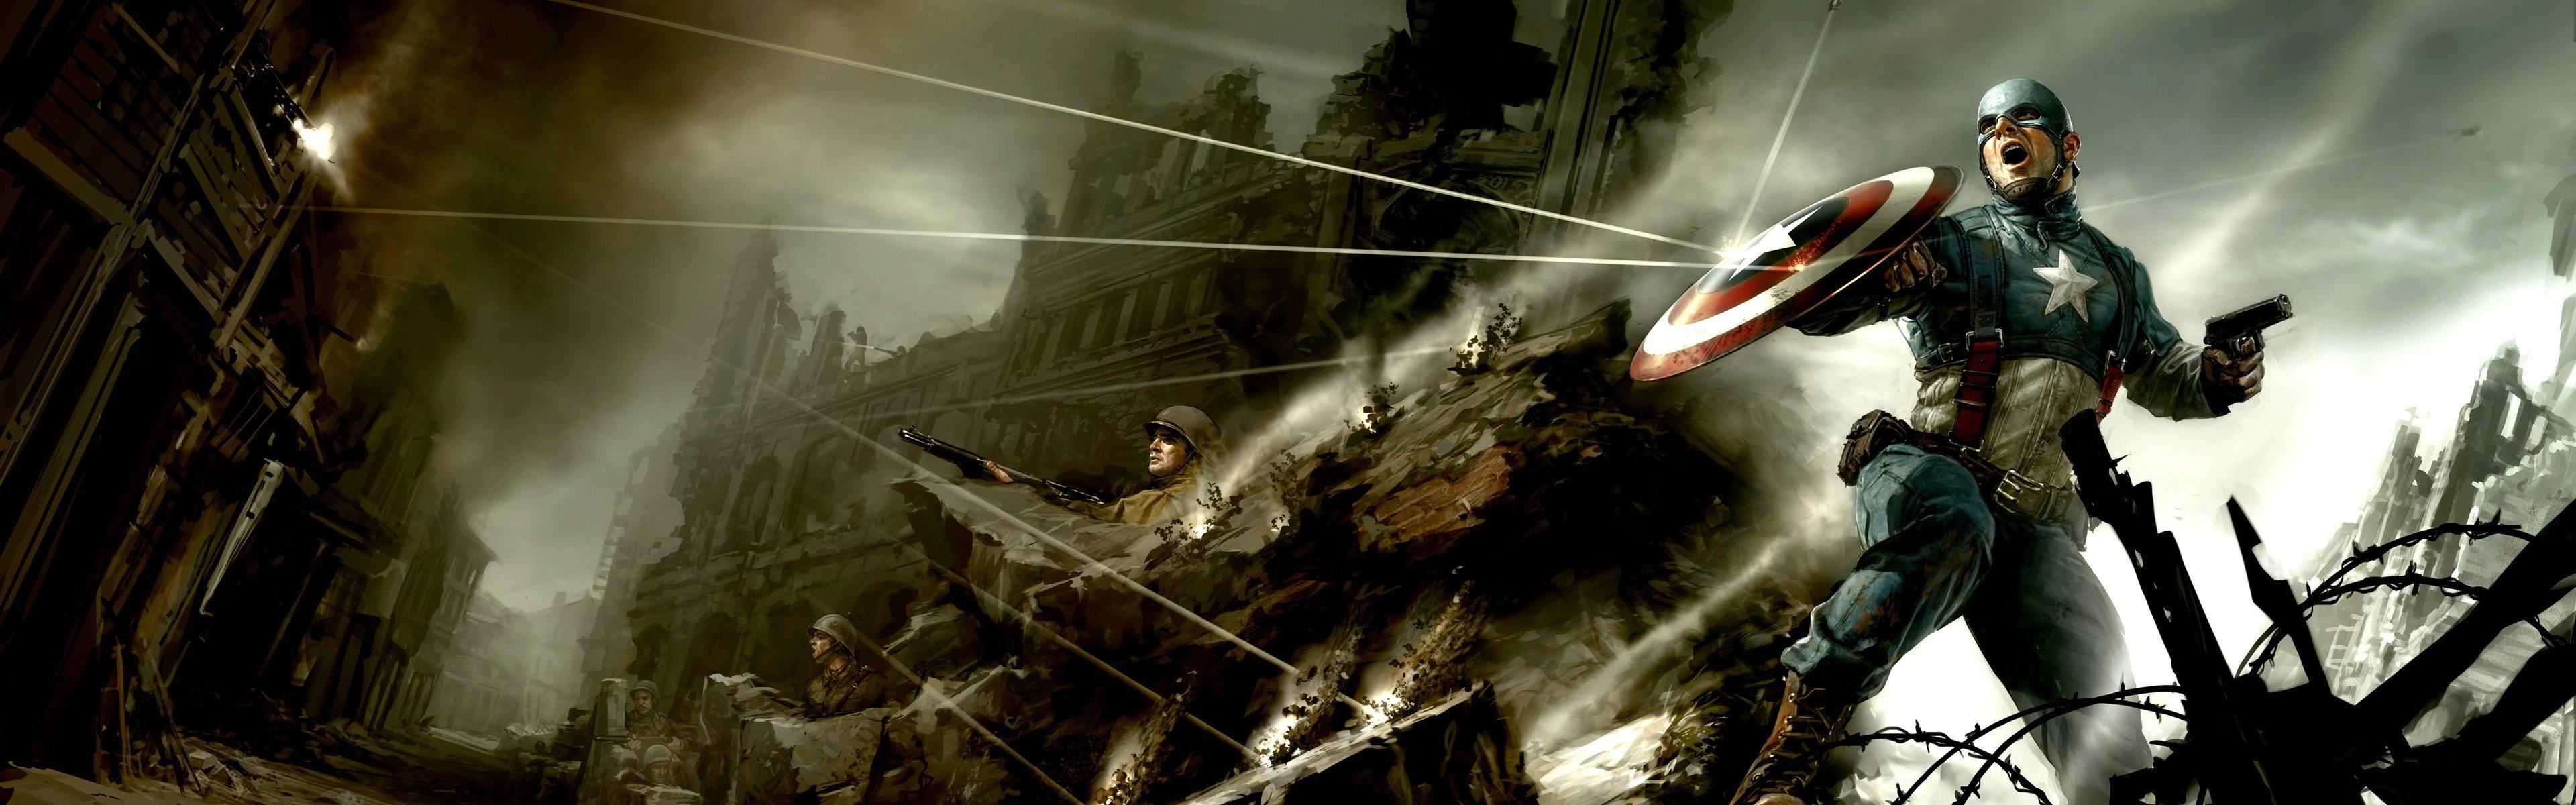 Movies Comics Captain America Concept Art Marvel Steve Rogers 3840x1200